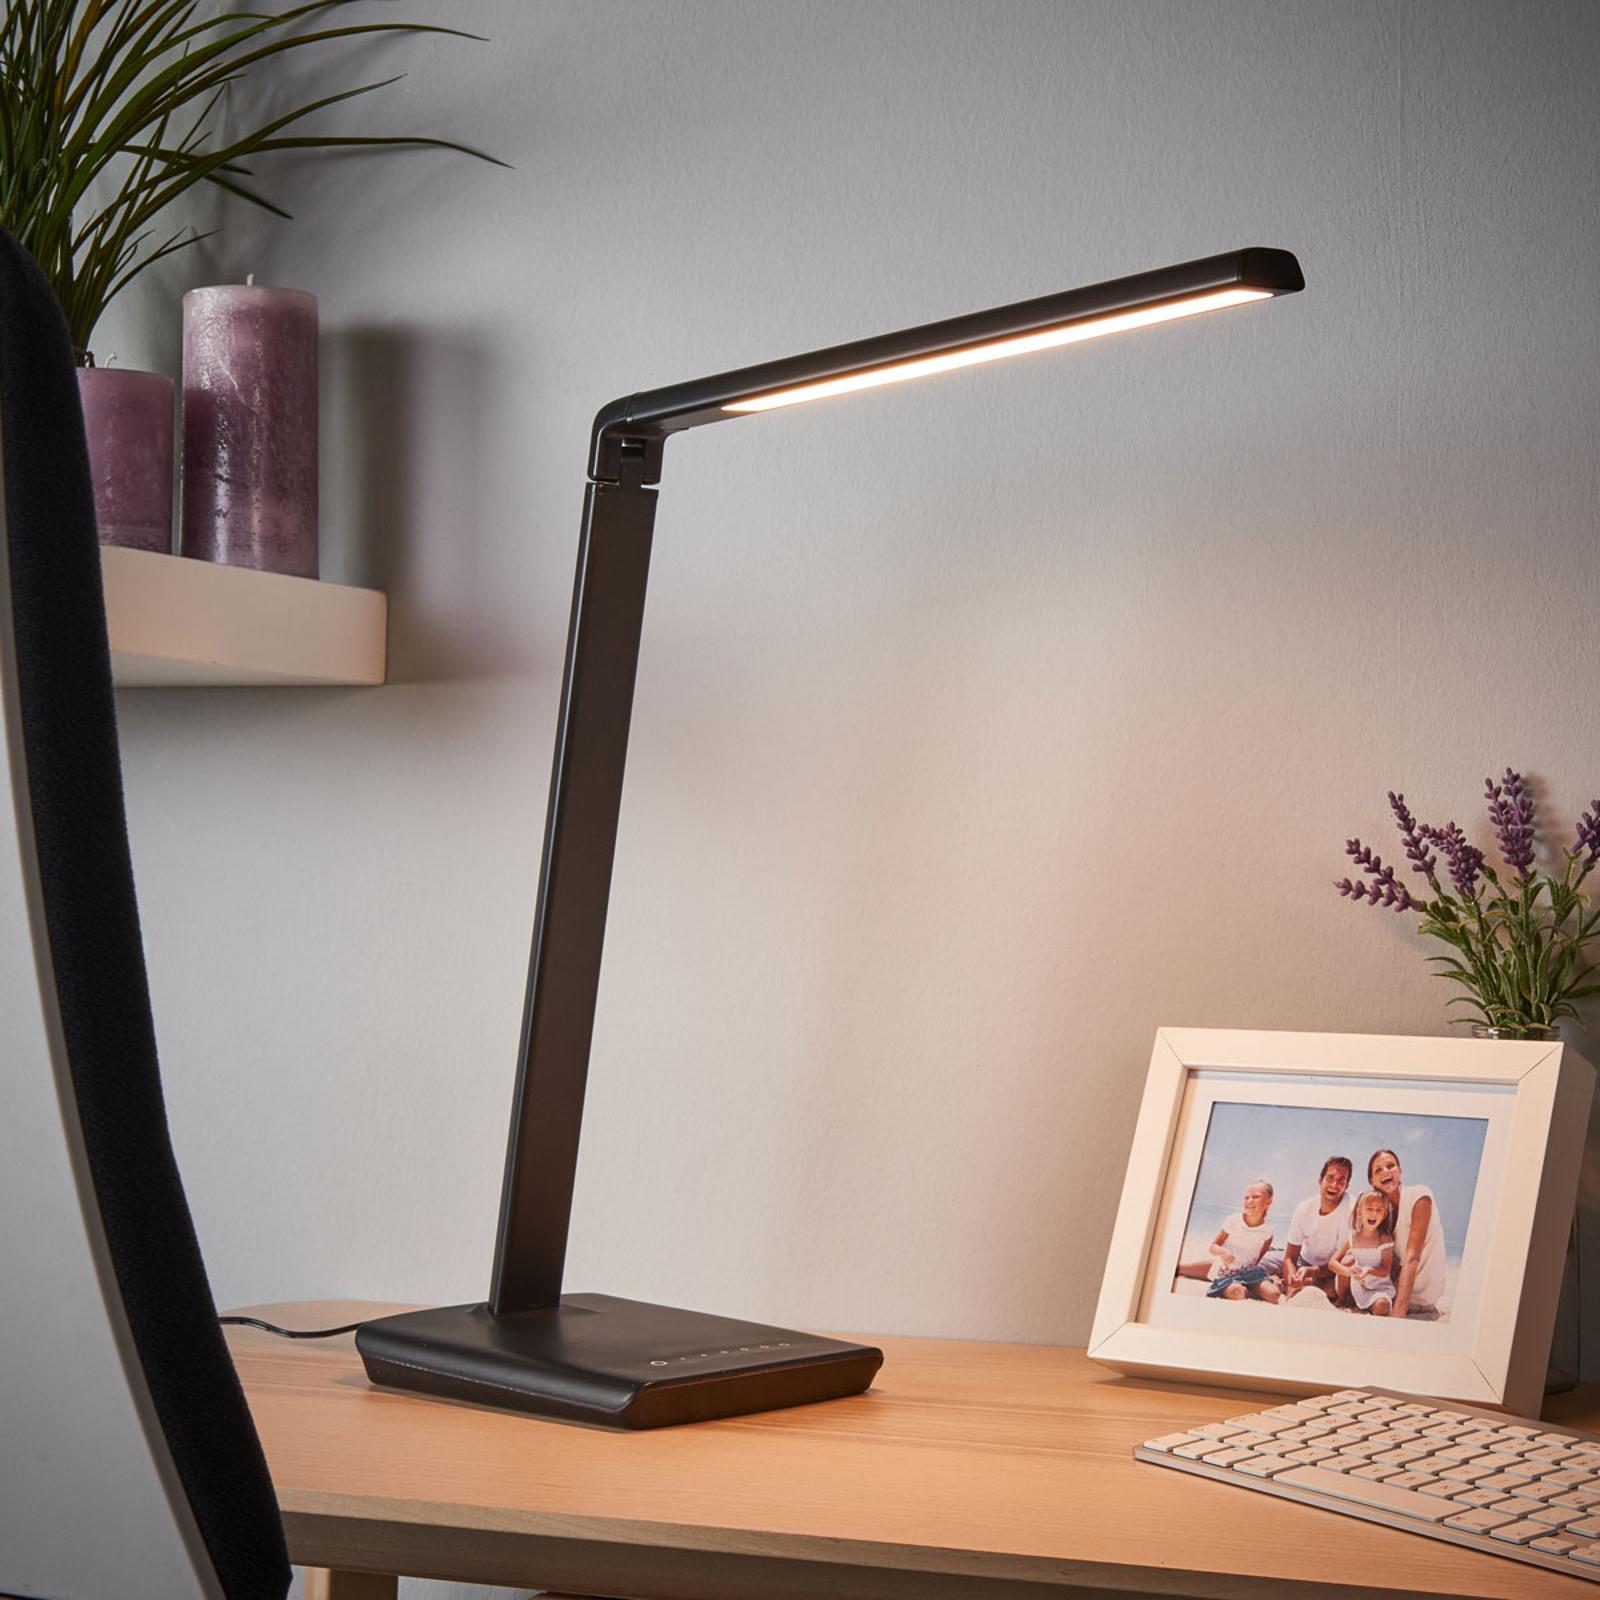 Kuno - LED-skrivbordslampa med USB-anslutning